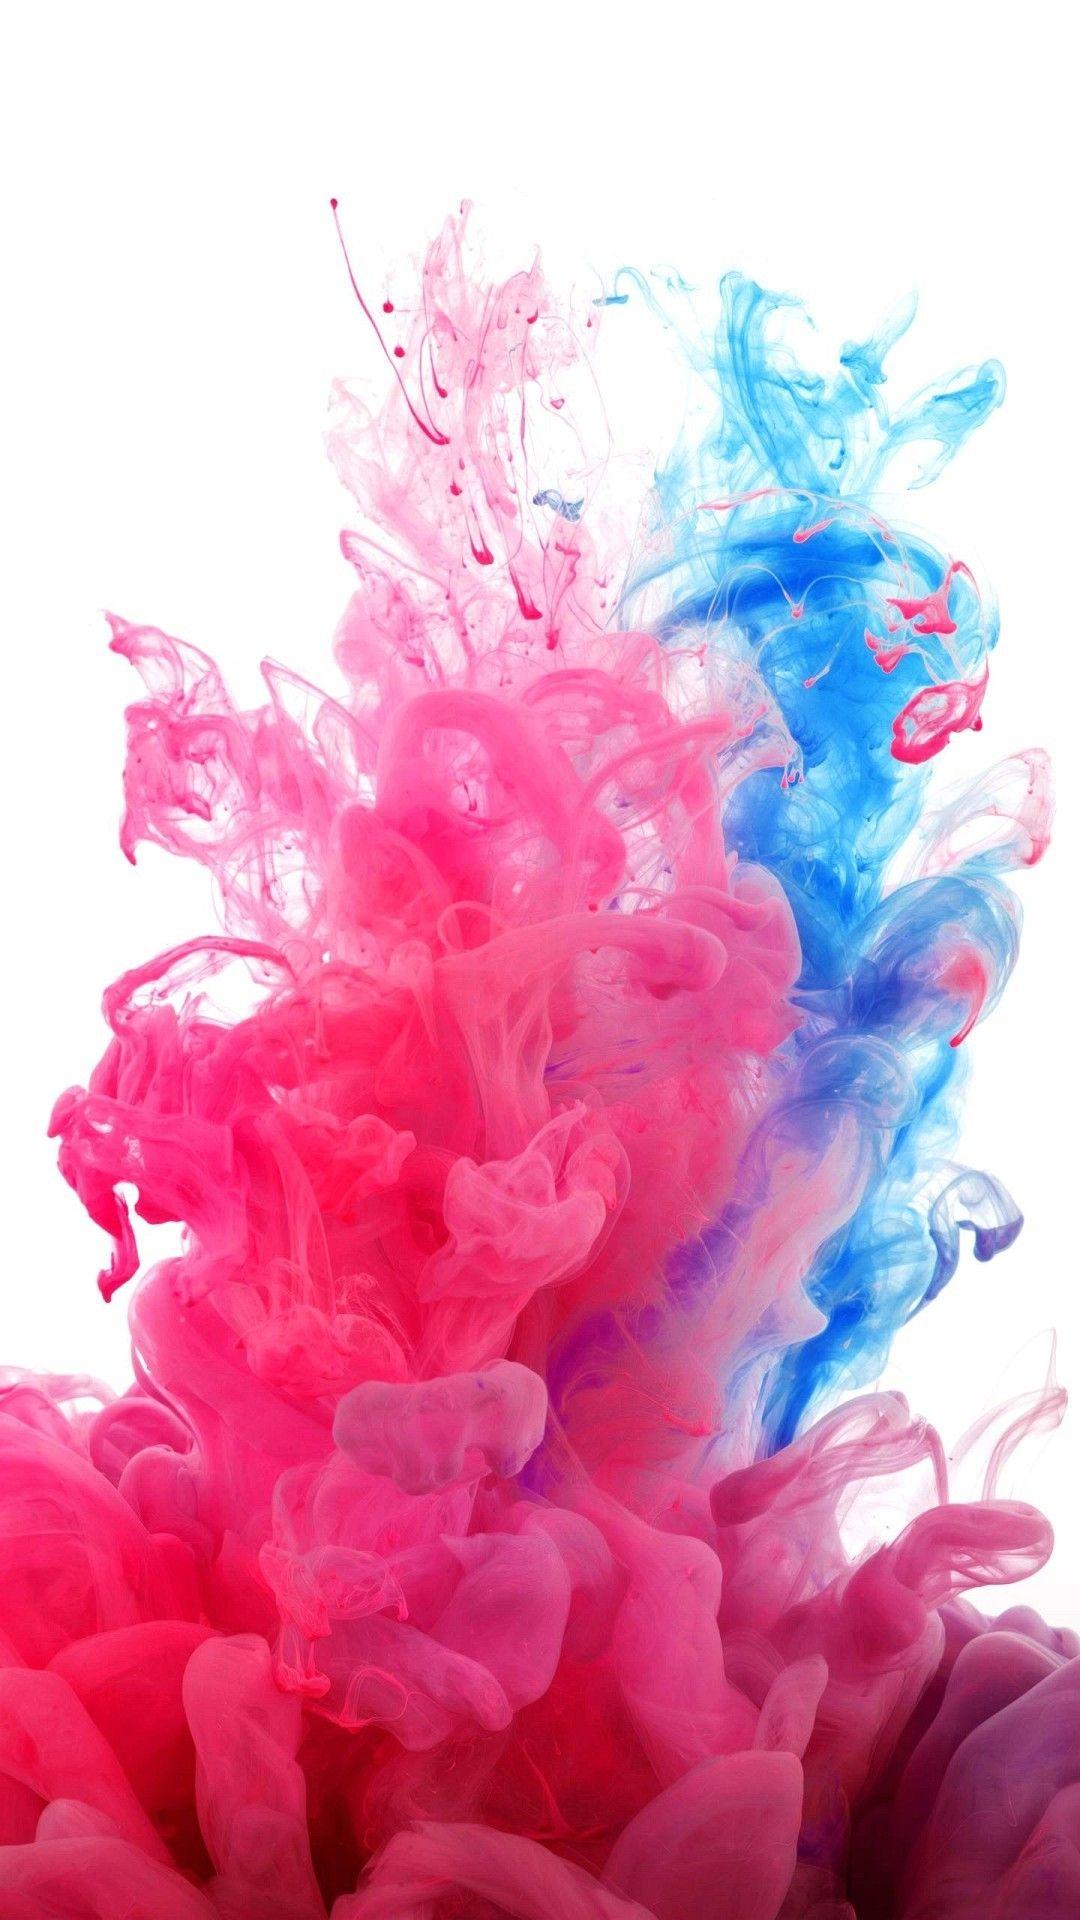 Sfondo Iphone 6 Plus Fumo Colorato Wallpapers In 2019 Iphone 5